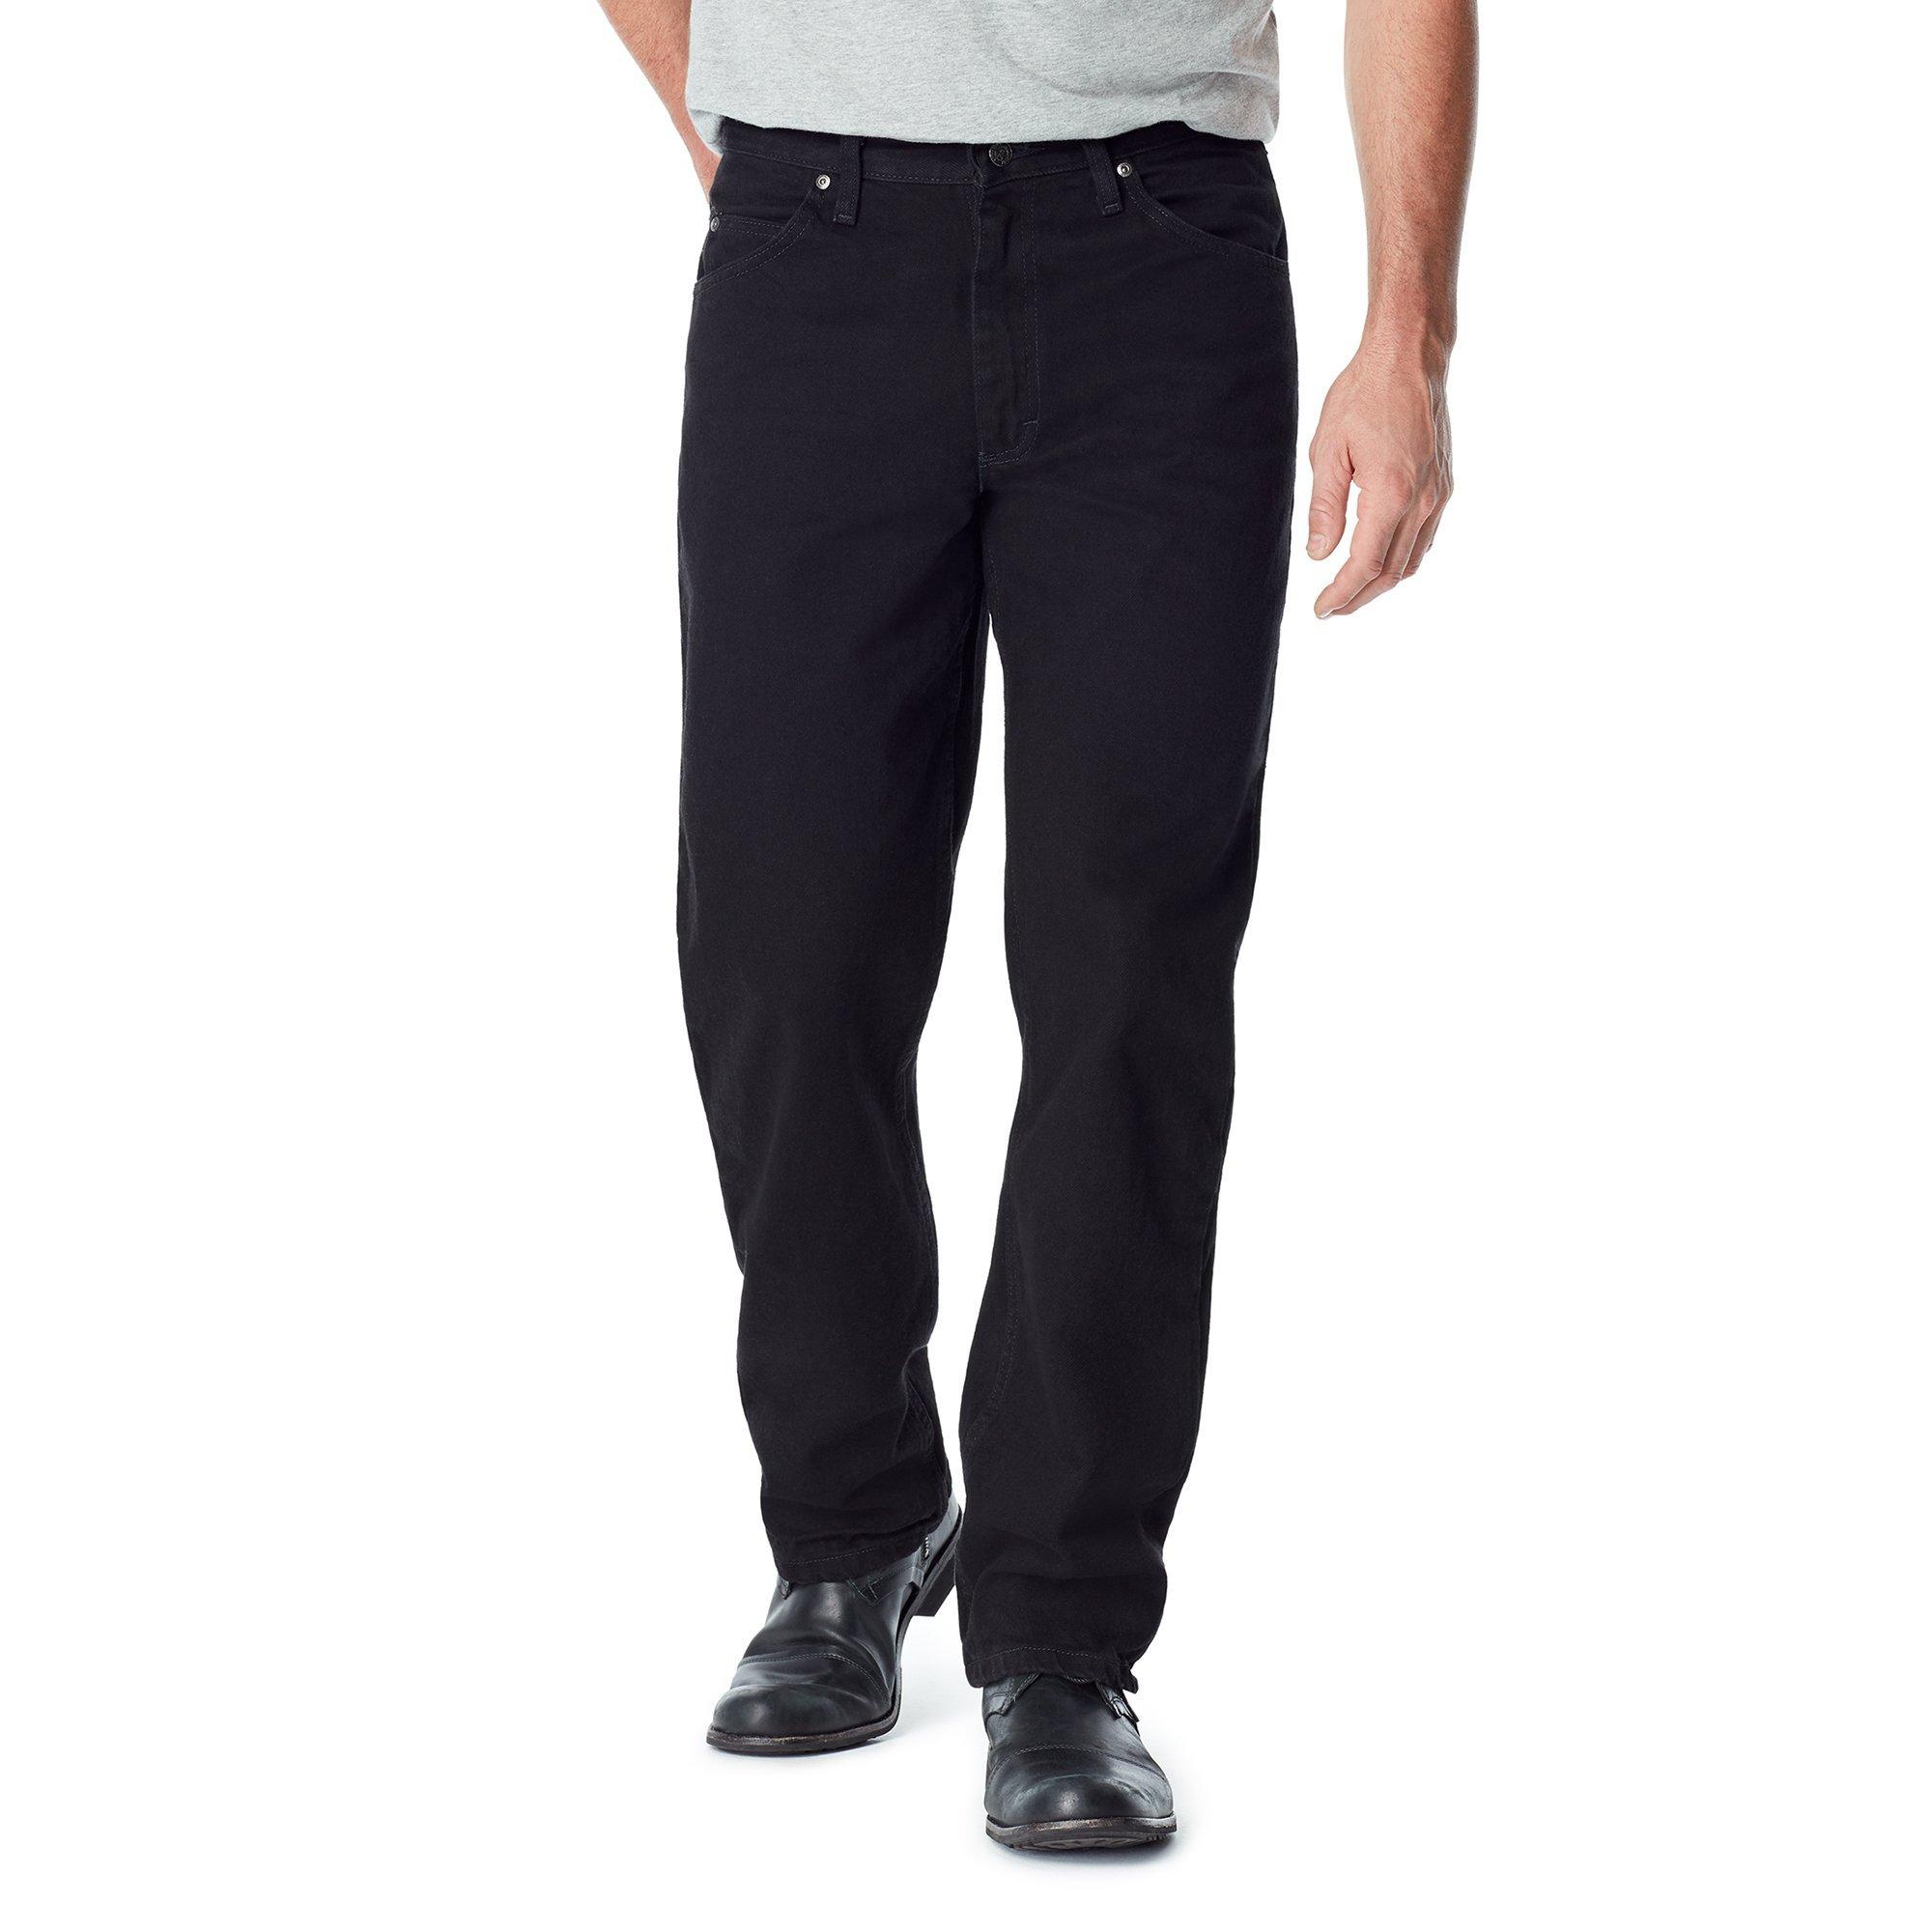 Wrangler Authentics Men's Classic Relaxed Fit Jean, Black, 38x32